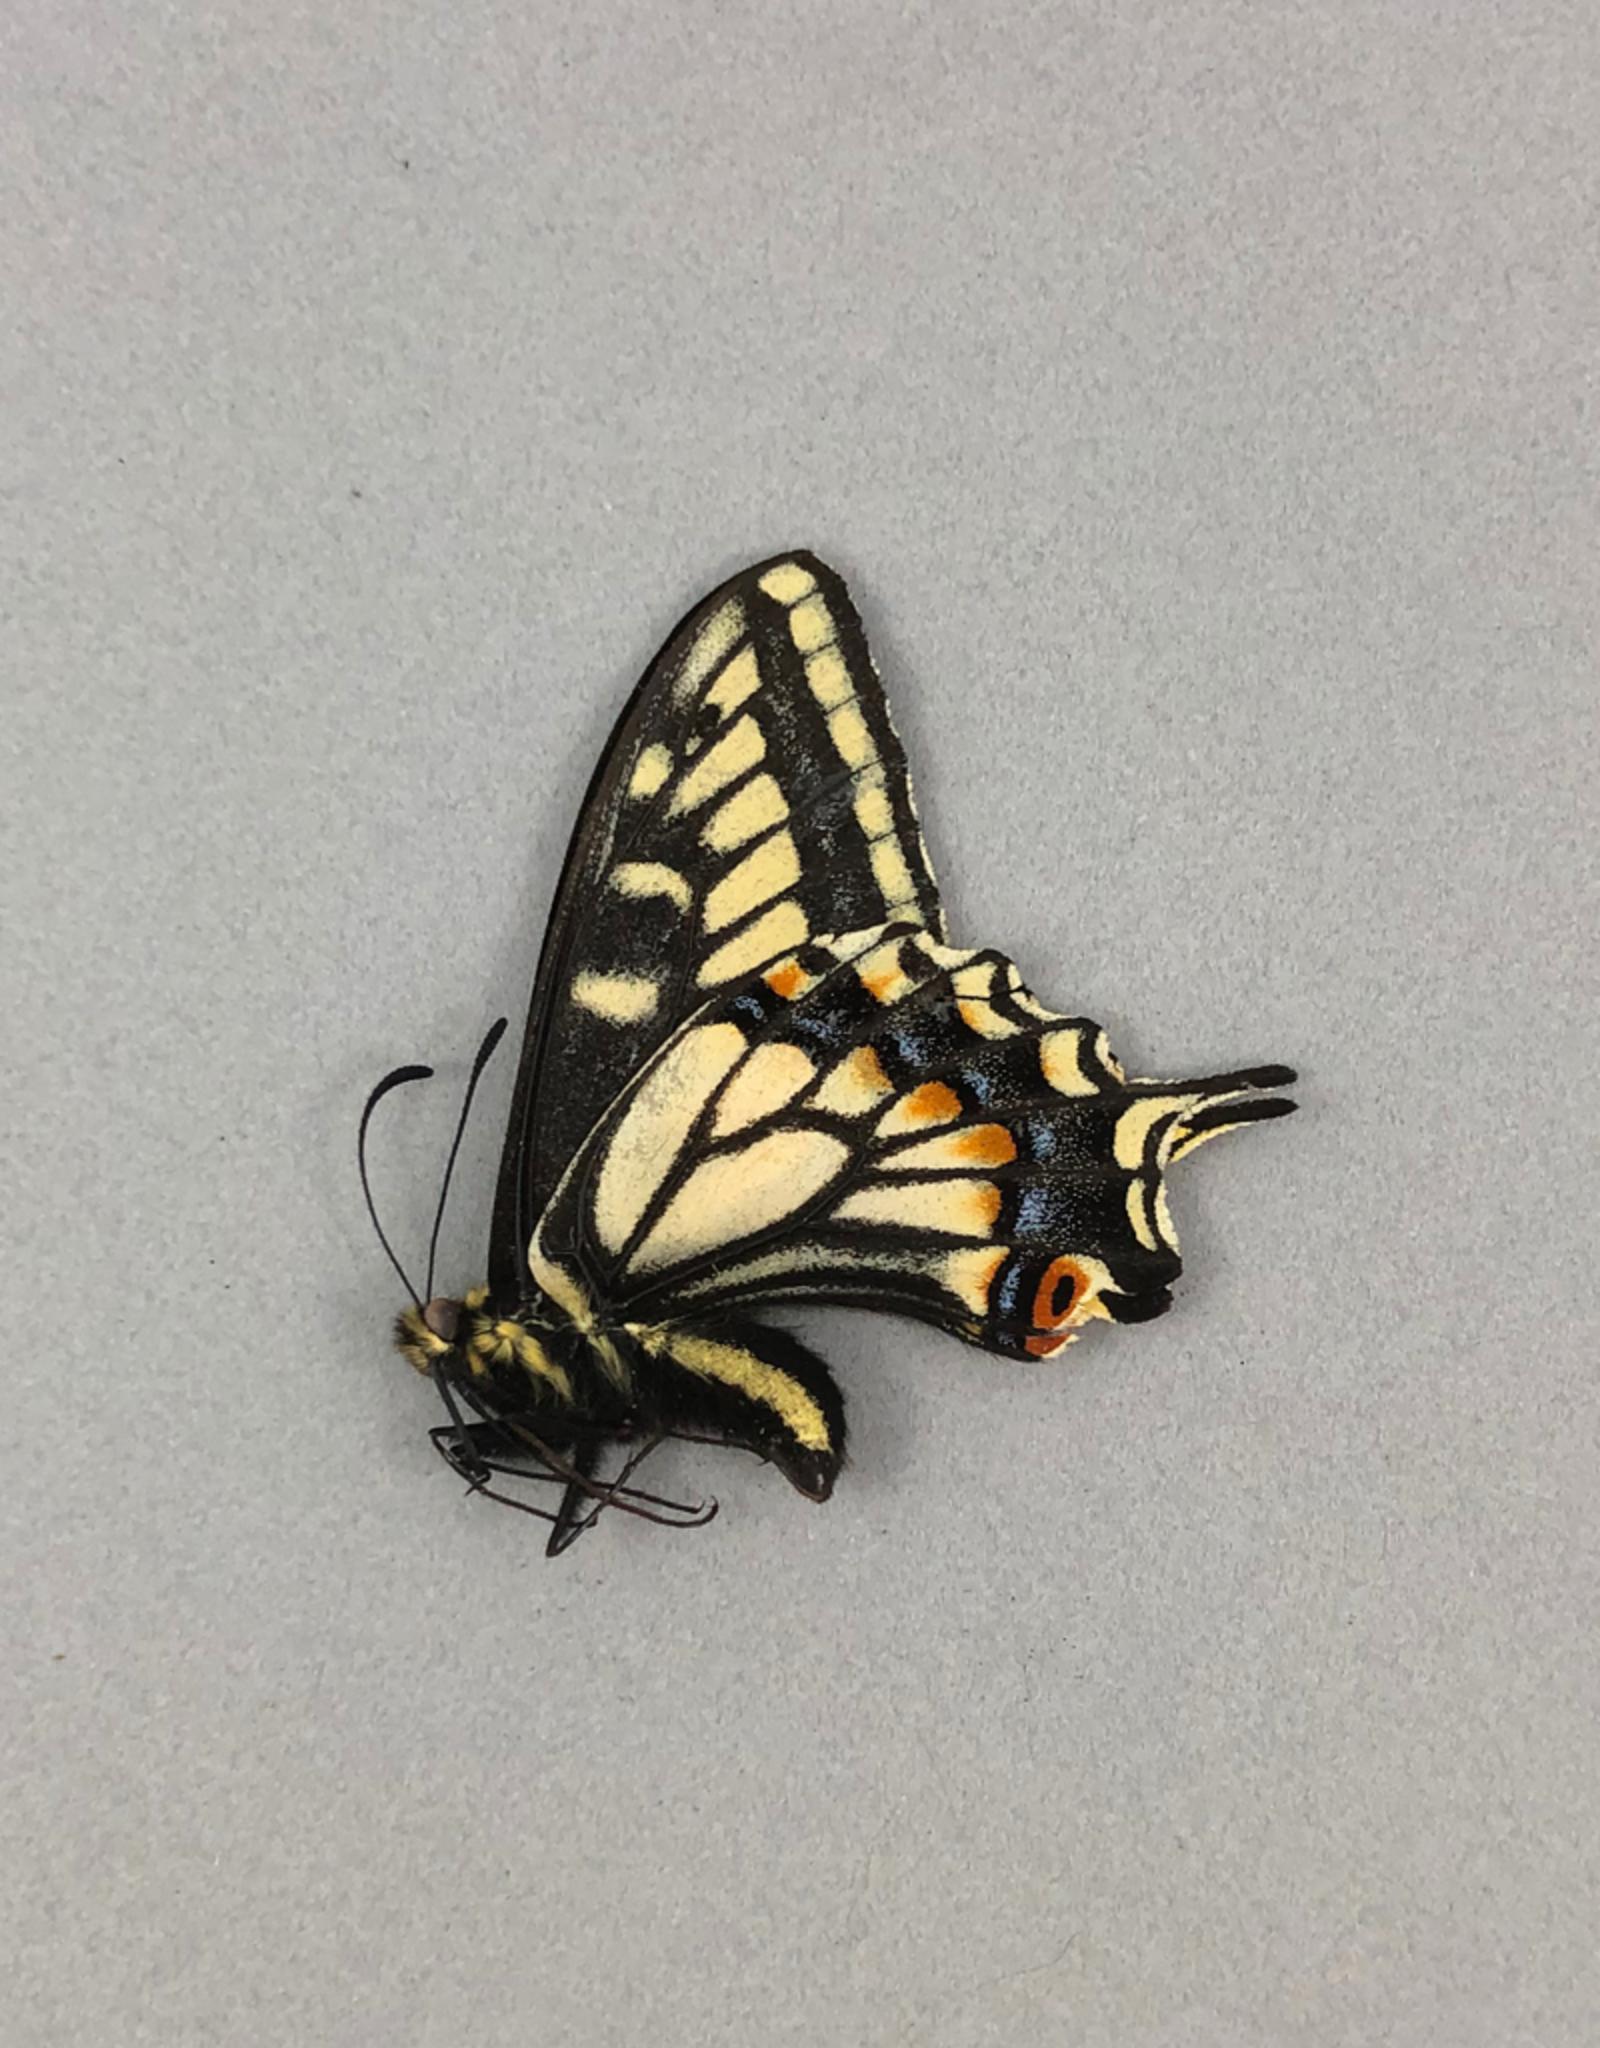 Papilio zelicaon M A1 Alberta, Canada